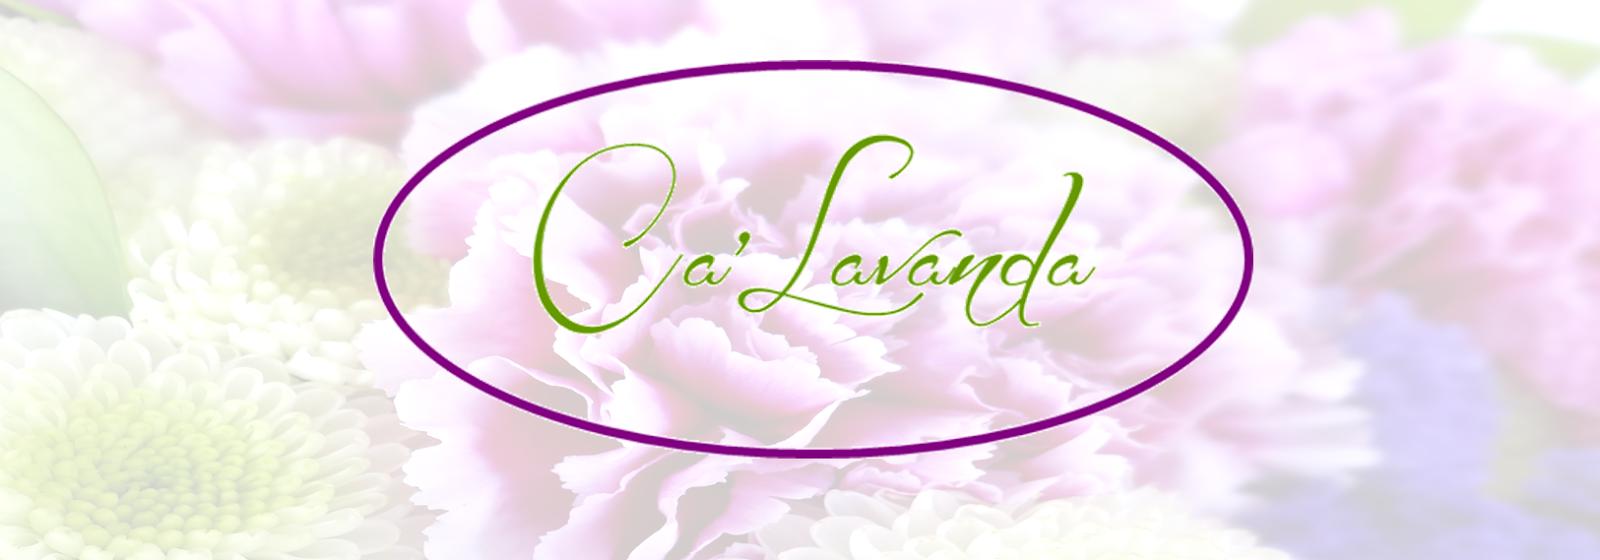 Ca'Lavanda